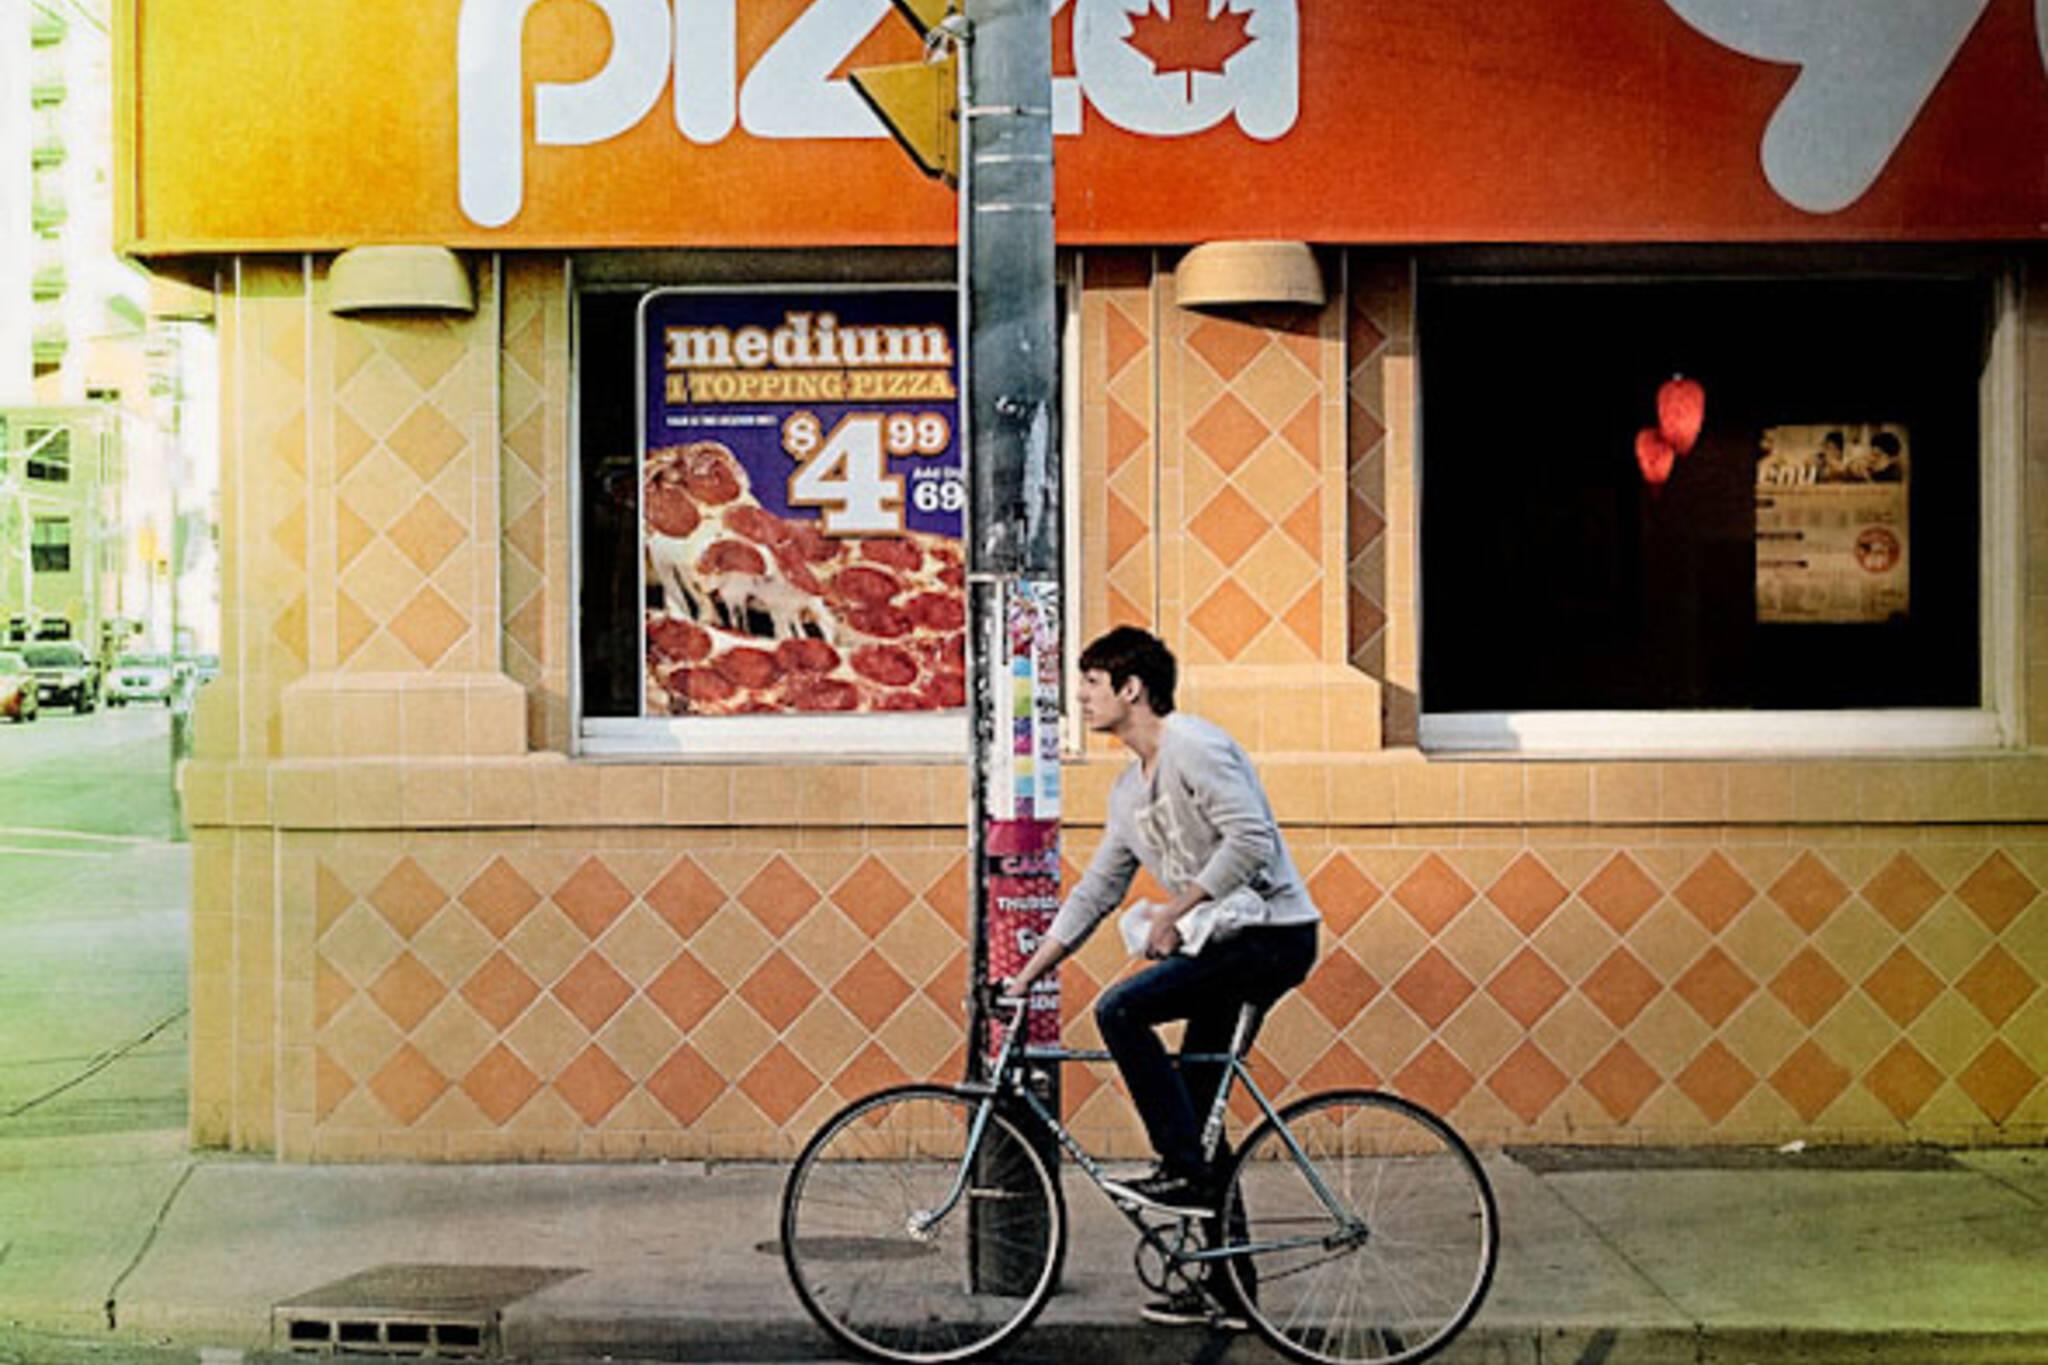 street, pizza, bike